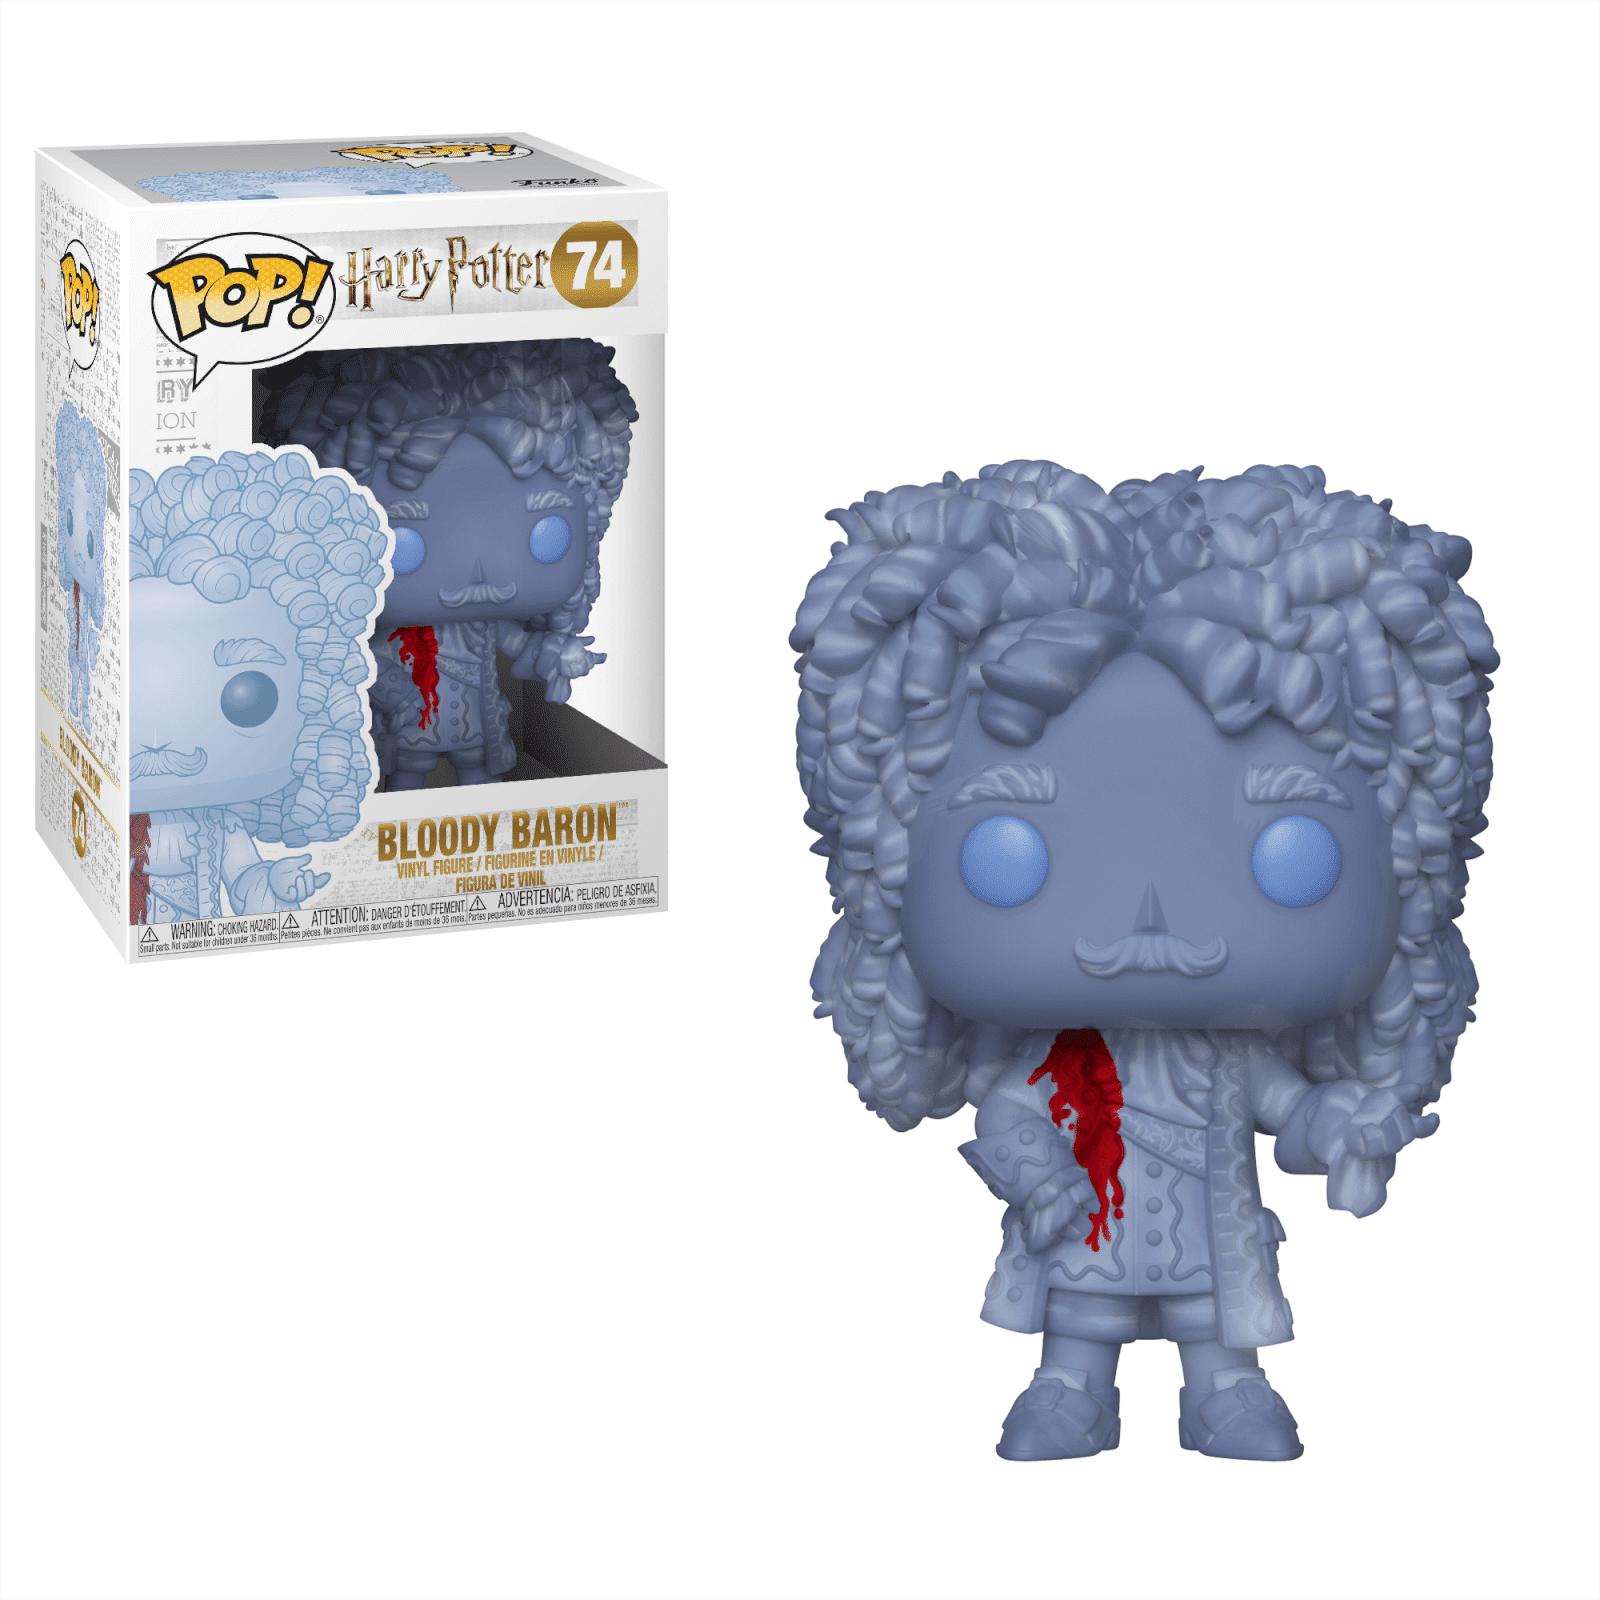 Pop! Vinyl Figurine Pop! Baron Sanglant Harry Potter